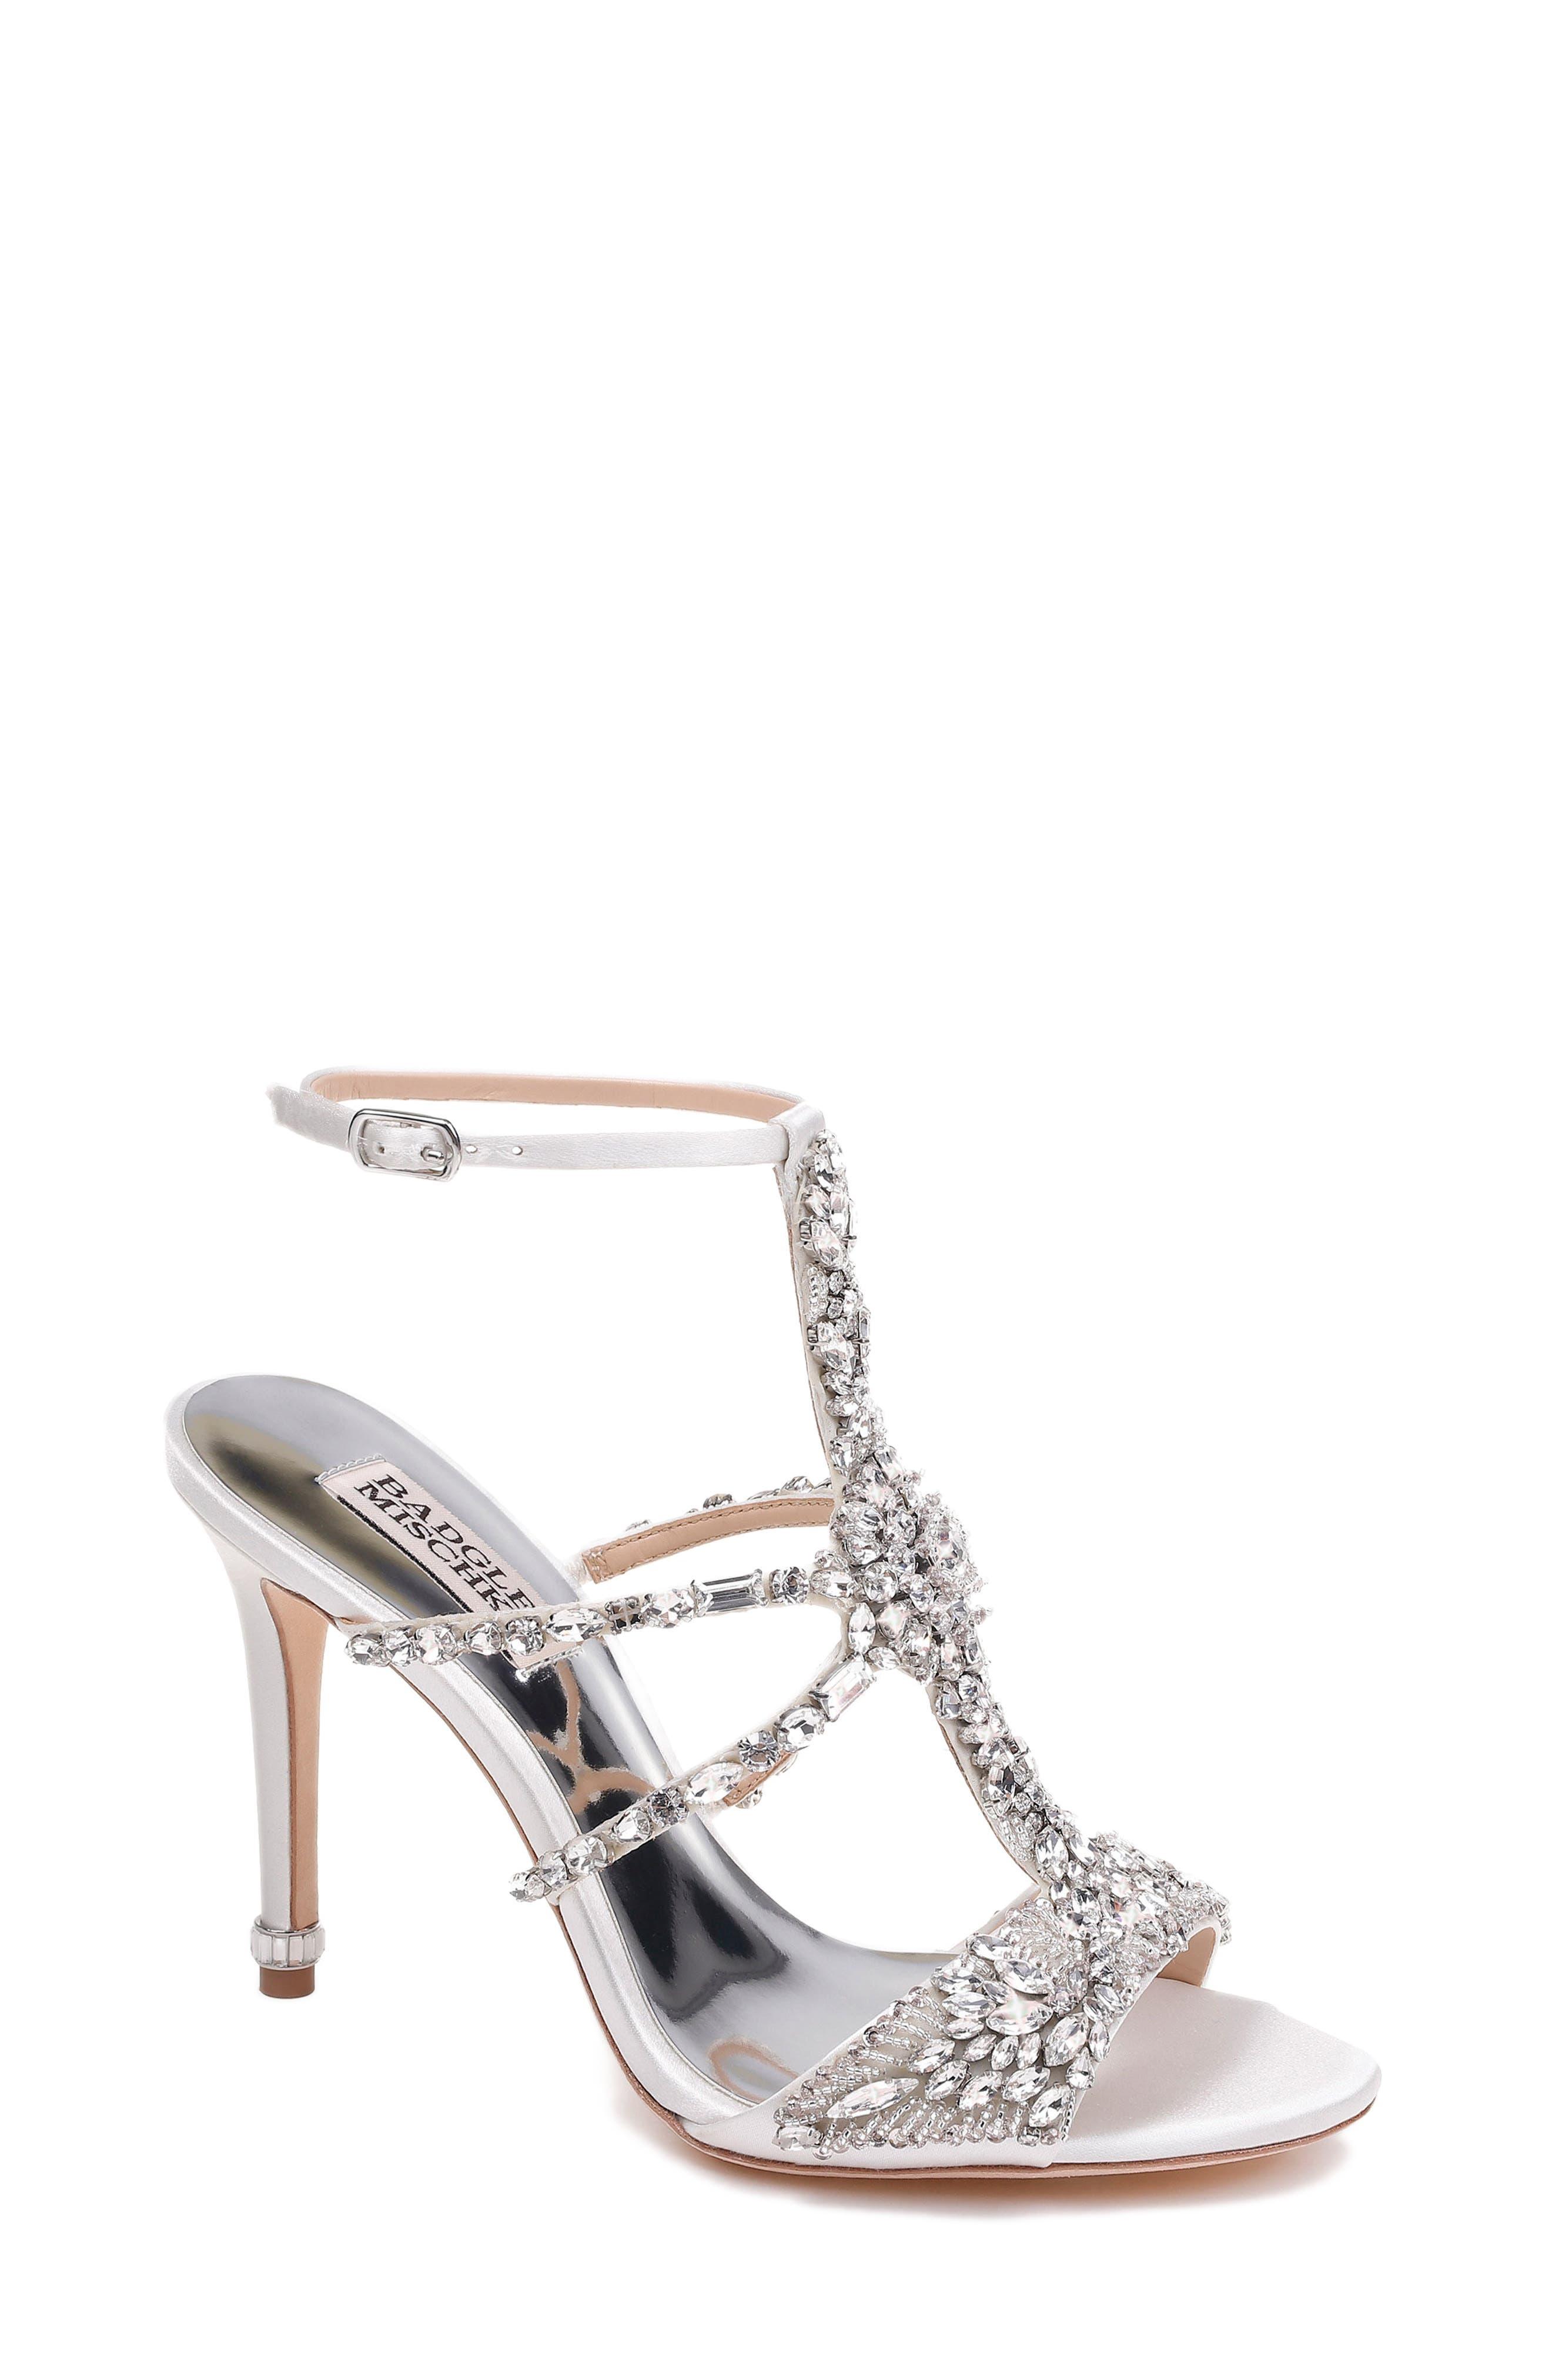 Badgley Mischka Hughes Crystal Embellished Sandal,                             Main thumbnail 1, color,                             142